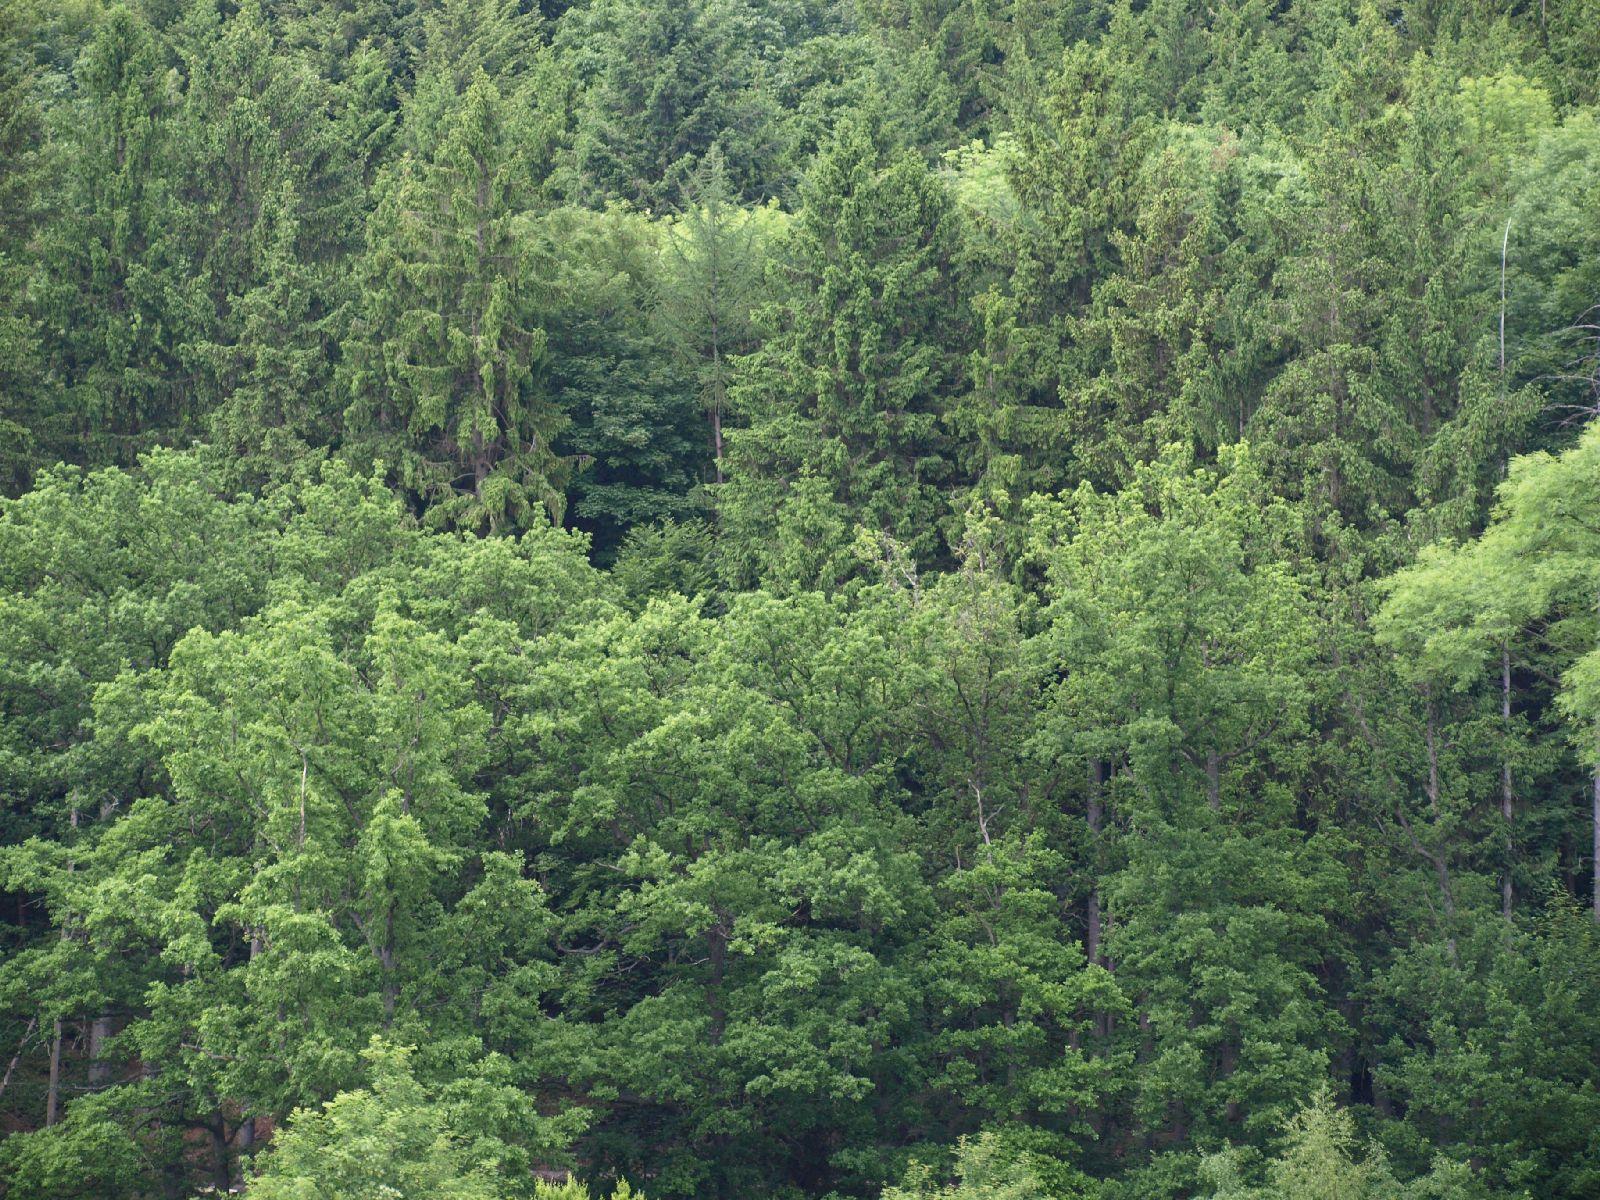 Pflanzen-Baum-Foto_Textur_B_P6036443